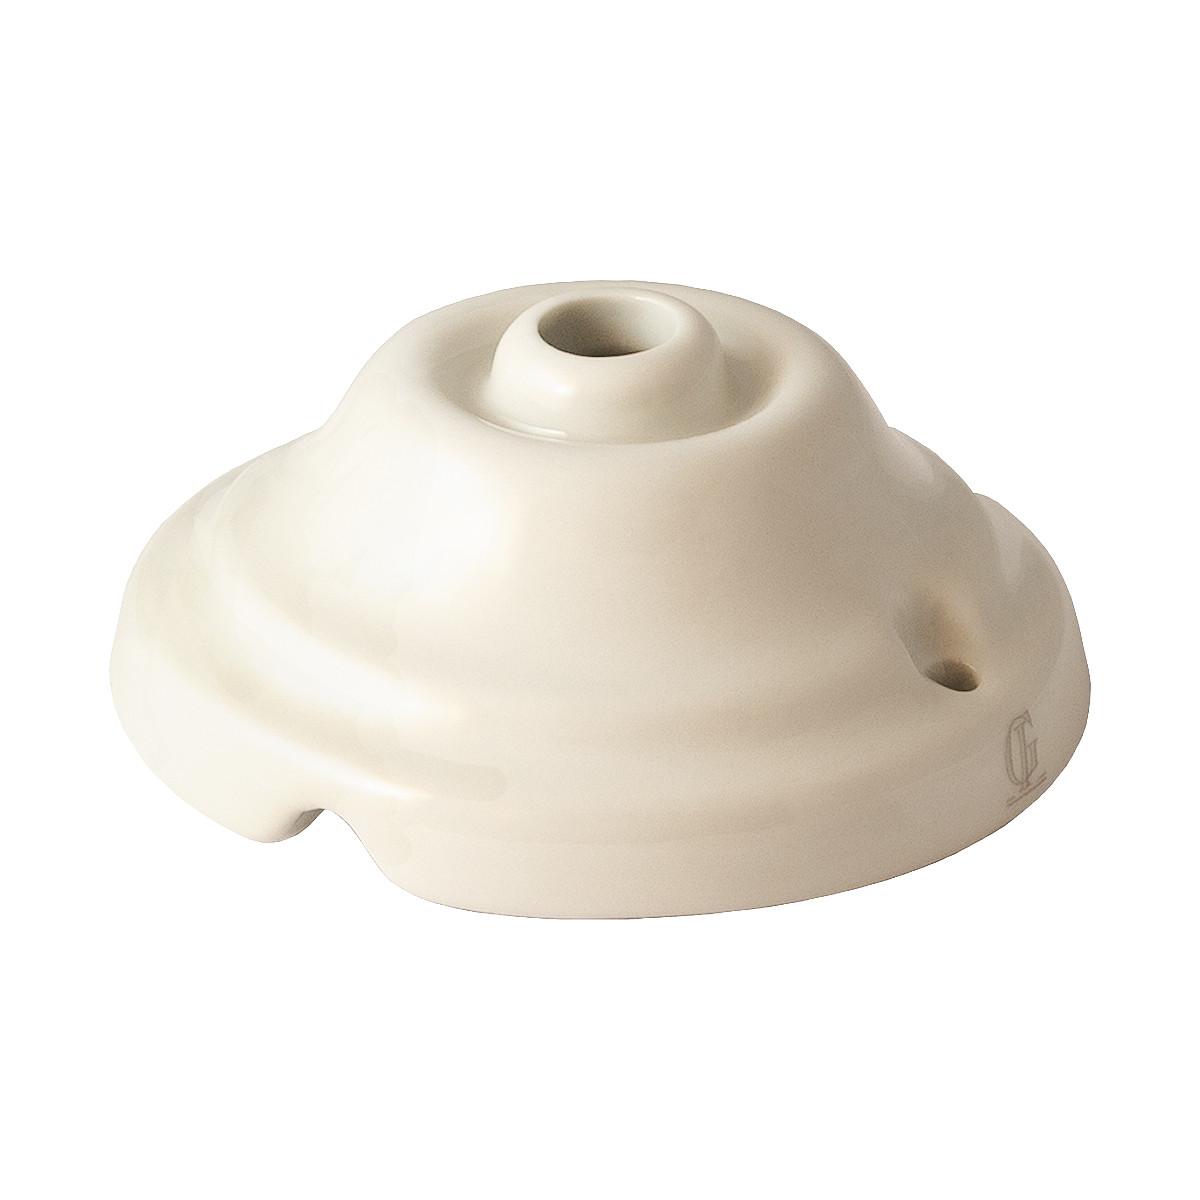 Canopy - Porcelain Glazed White